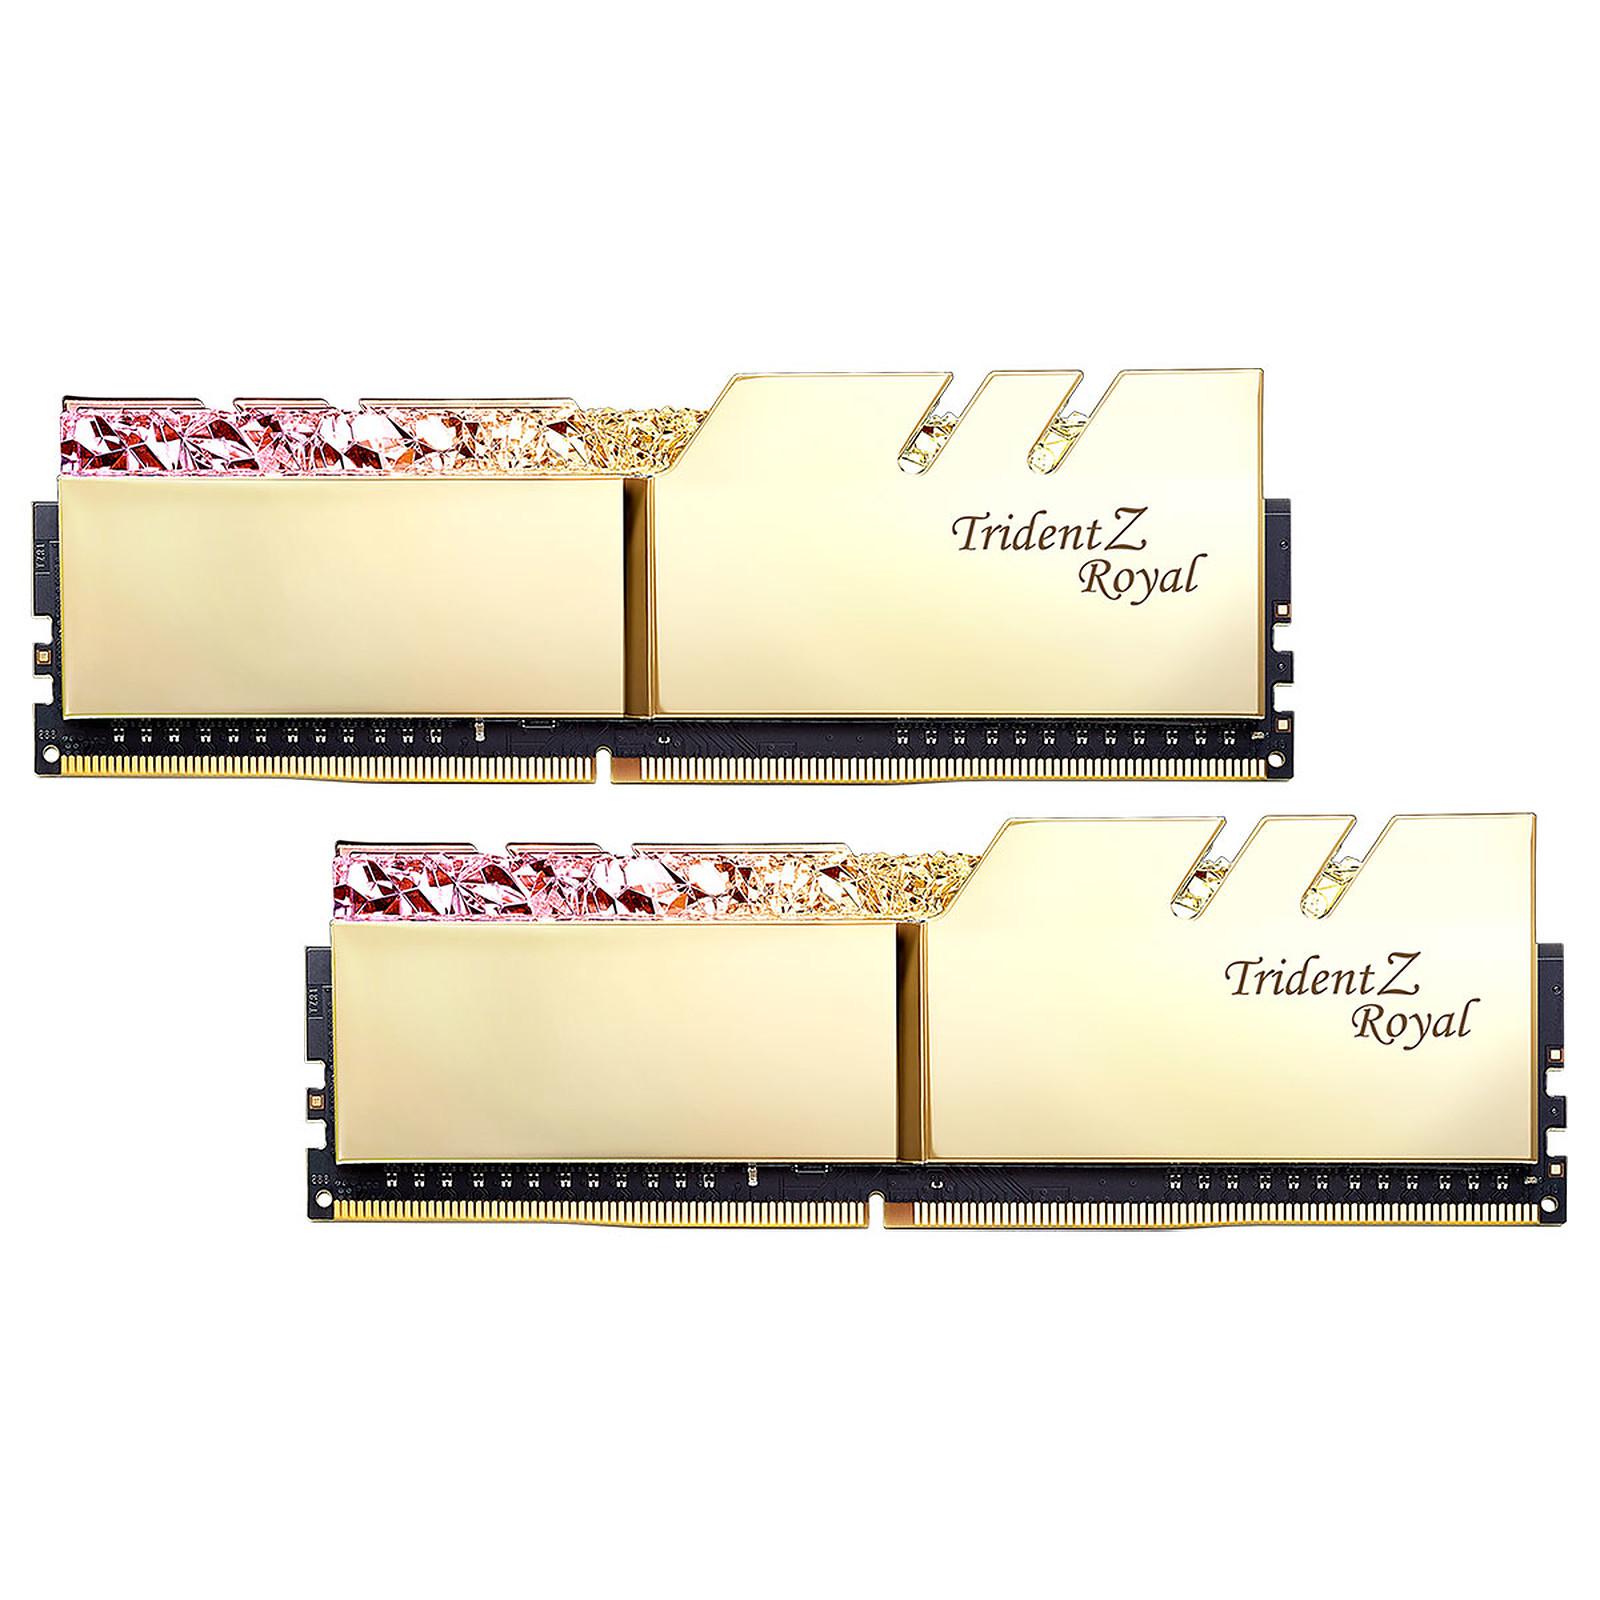 G.Skill Trident Z Royal 16 Go (2x 8 Go) DDR4 3200 MHz CL14 - Or